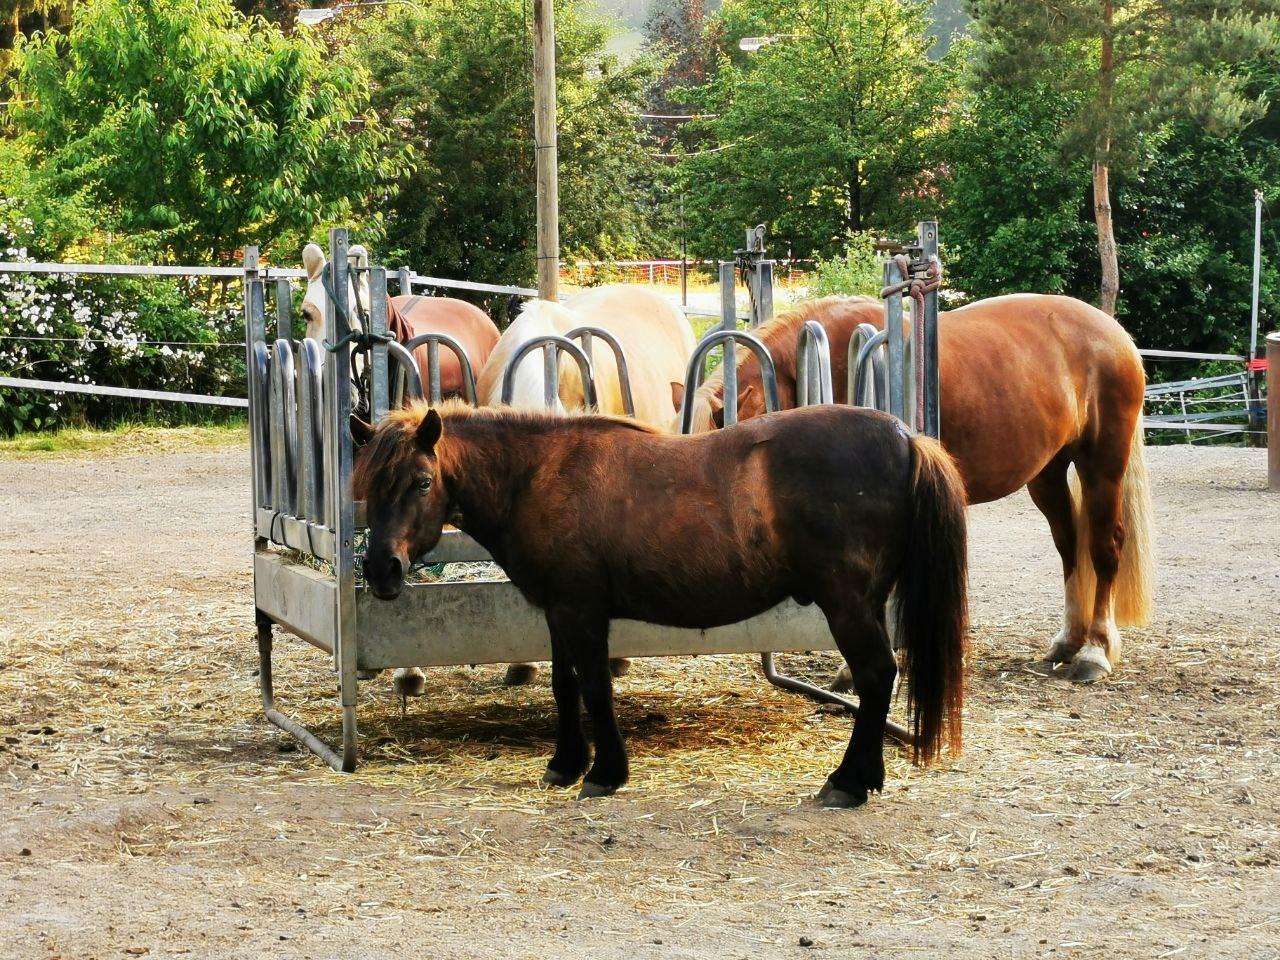 Pferde-Reiter-Hof Gösingen Anlage